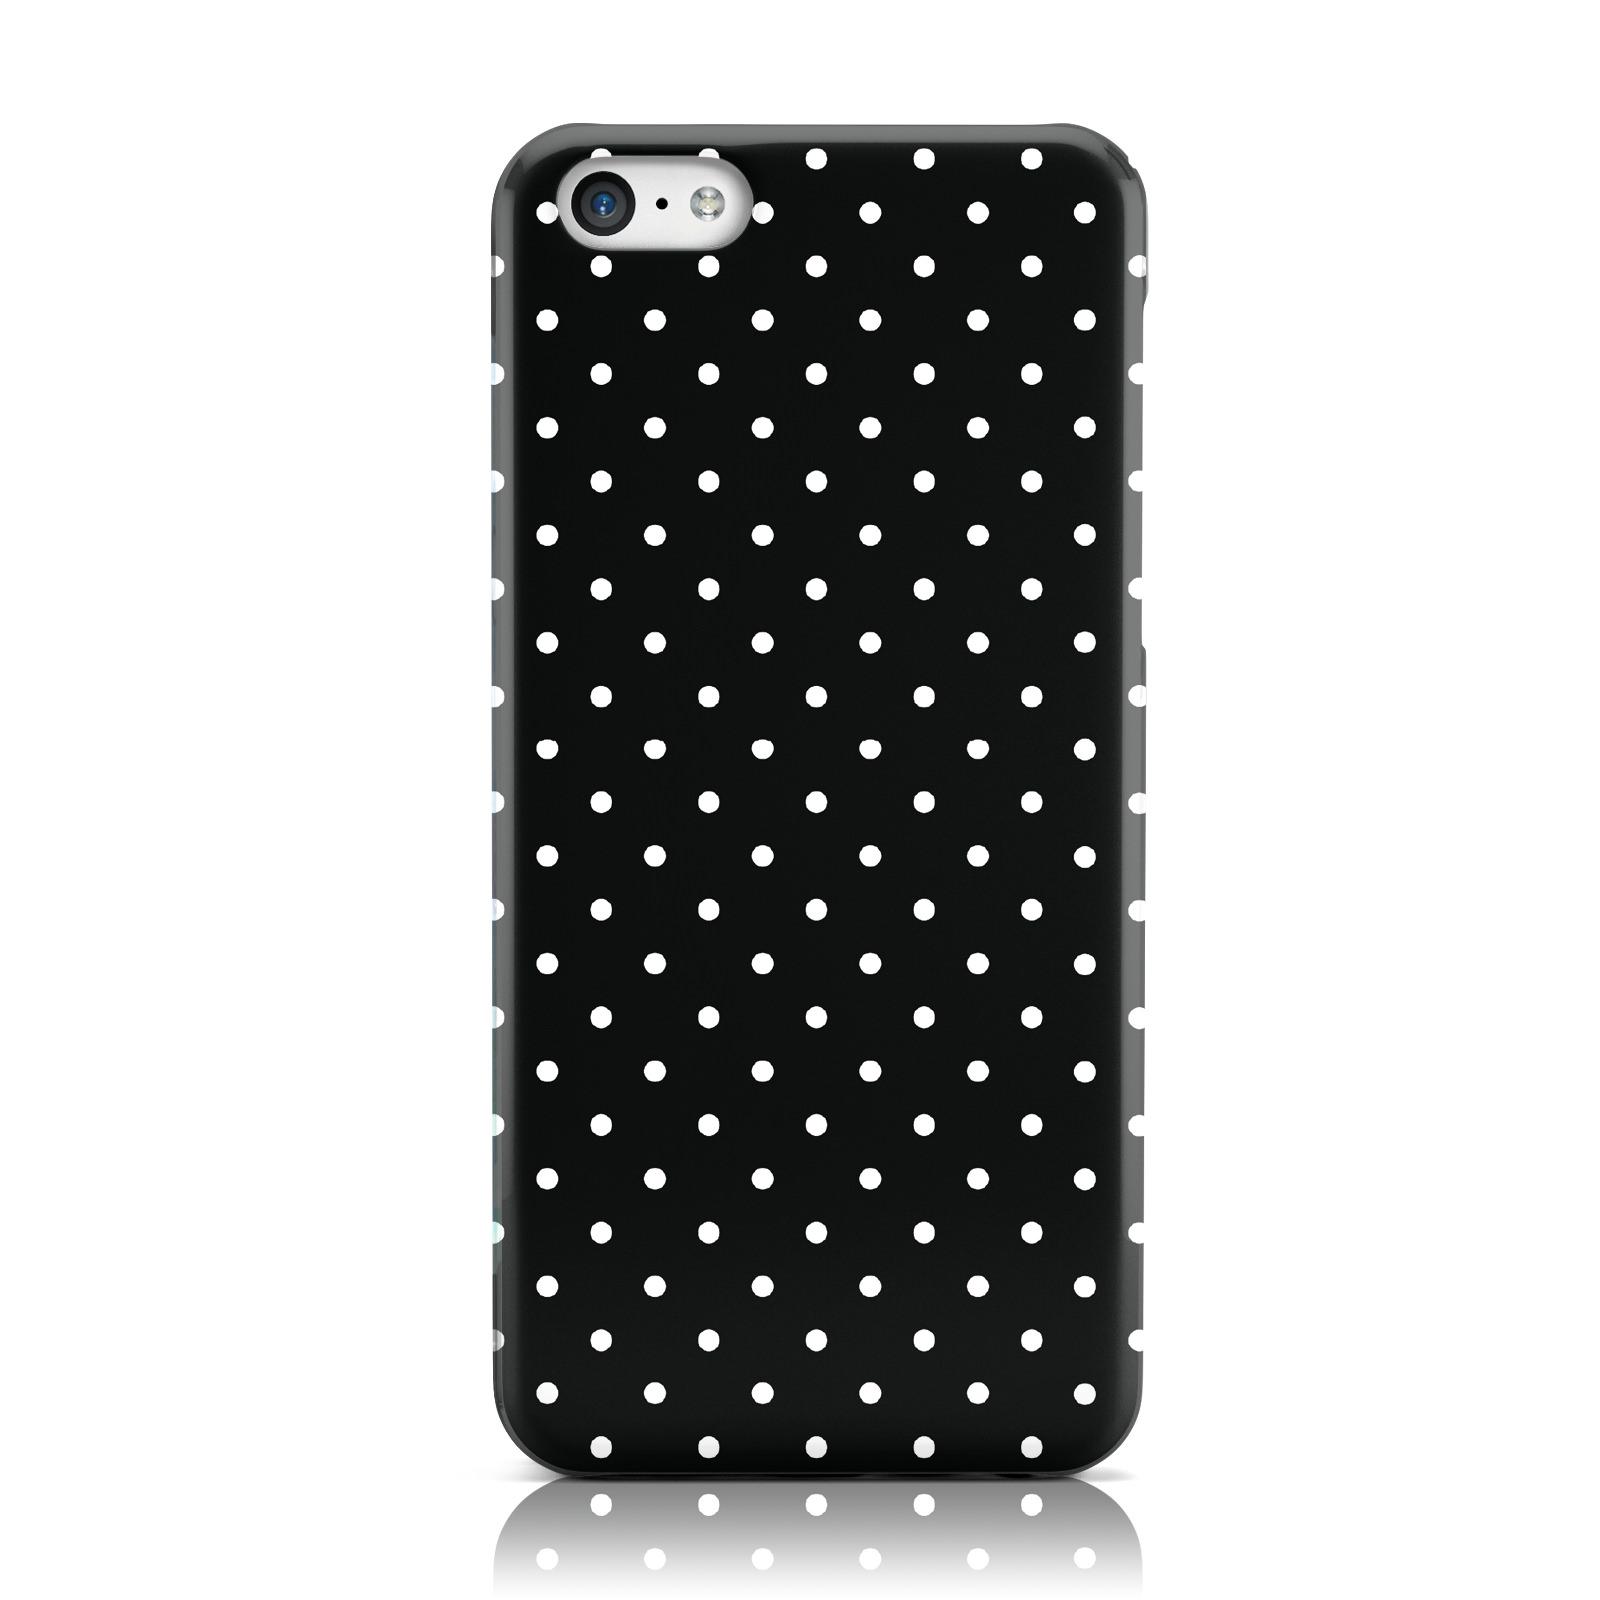 dyefor-Polka-Dot-Coleccion-Rigida-Movil-Funda-De-Telefono-Para-Apple-iPhone-5c